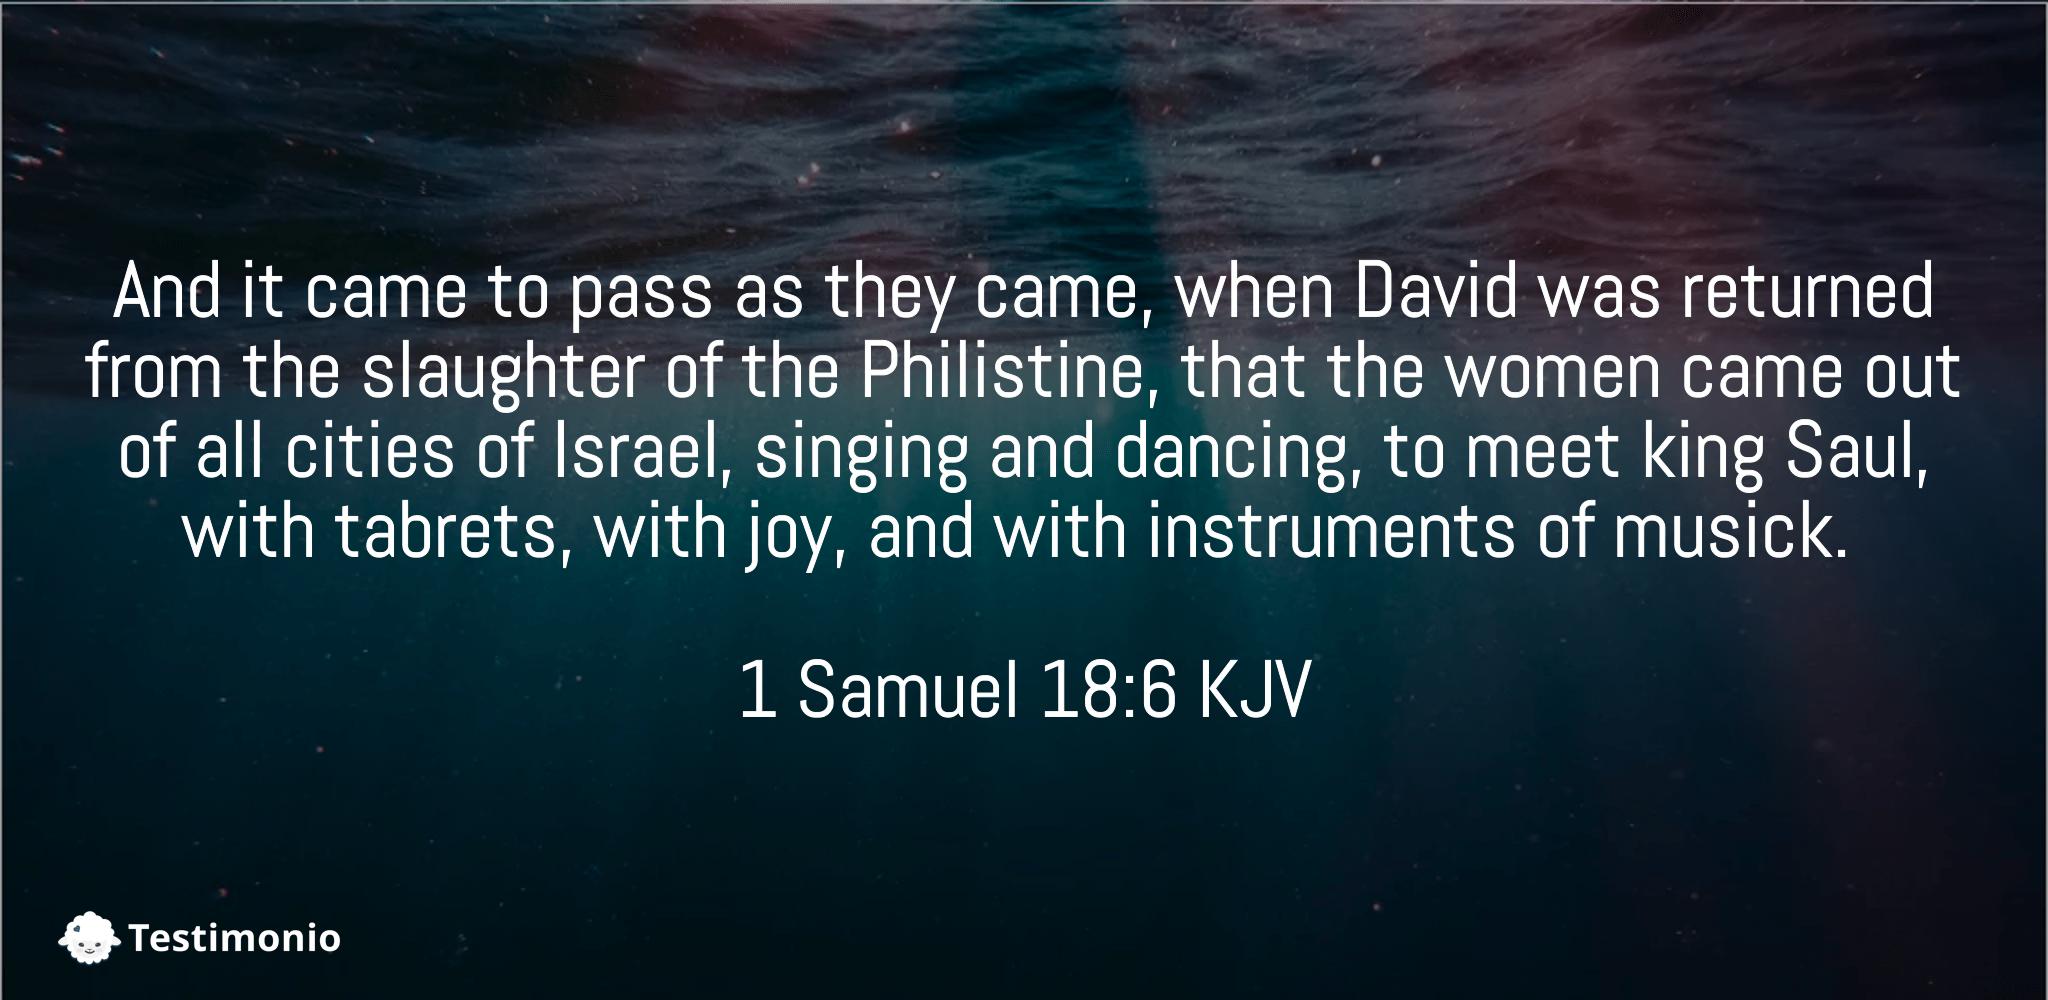 1 Samuel 18:6